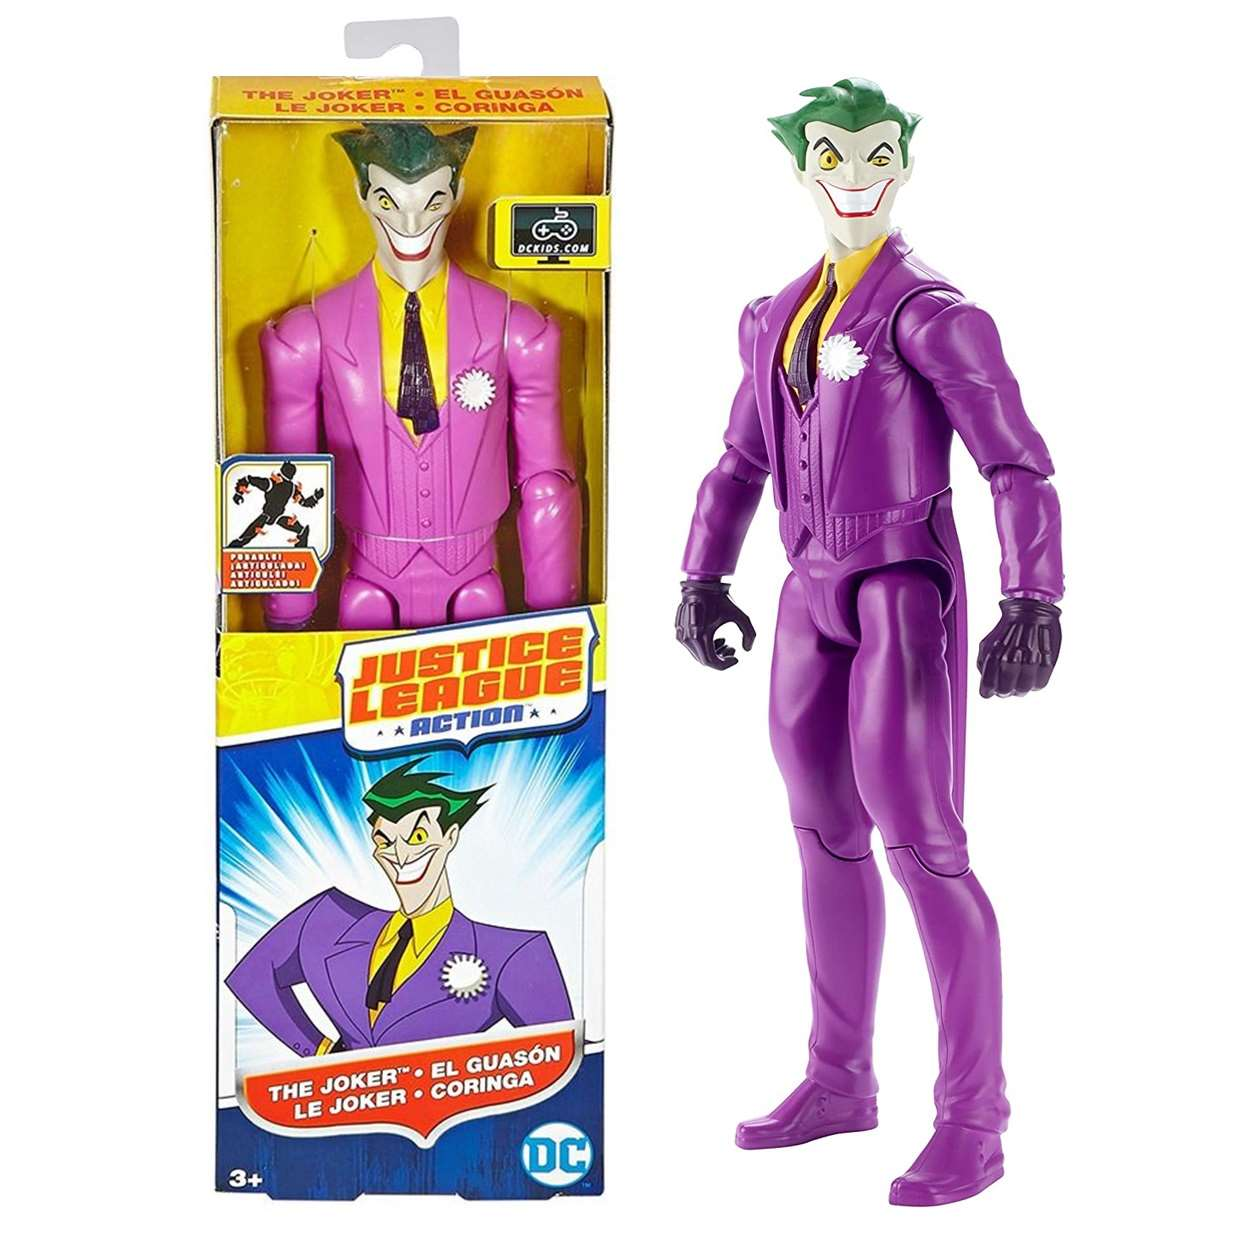 The Joker Figura Dc Justice League Action Mattel 12 Pulgadas